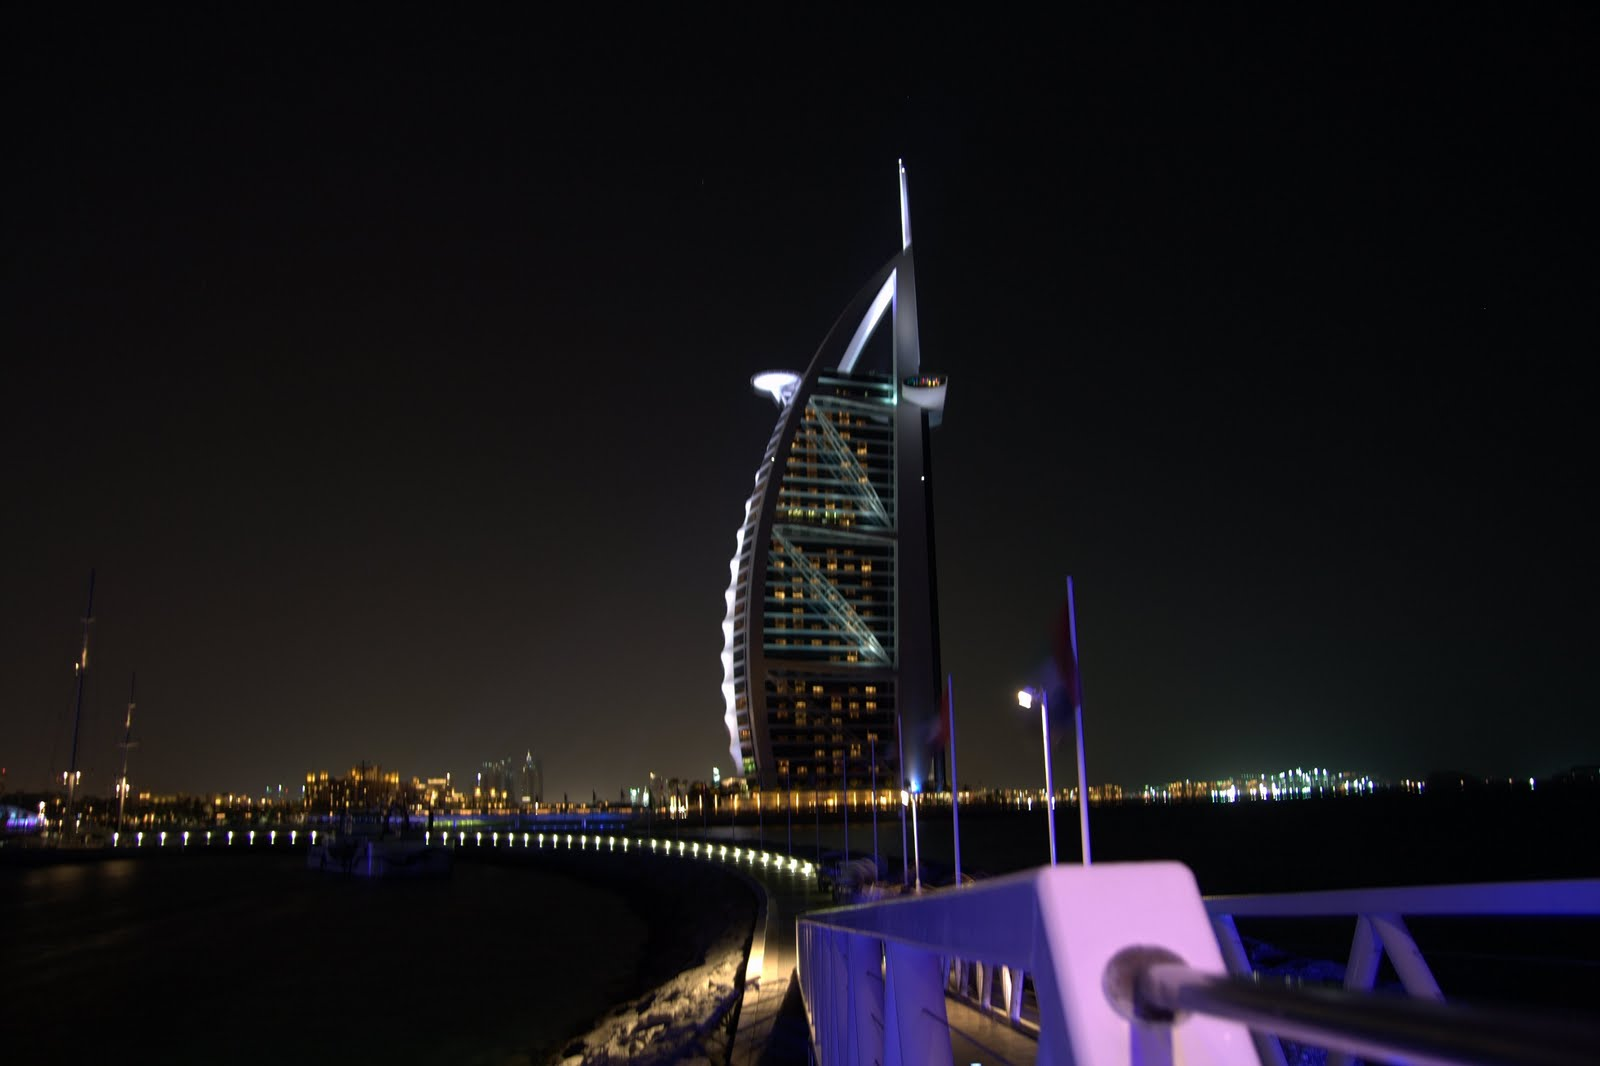 http://4.bp.blogspot.com/-bf4zya61G4E/TgXmqFeQ6XI/AAAAAAAAHm8/lonzdGqhECg/s1600/dubai_burj_al_arab_uae.jpg